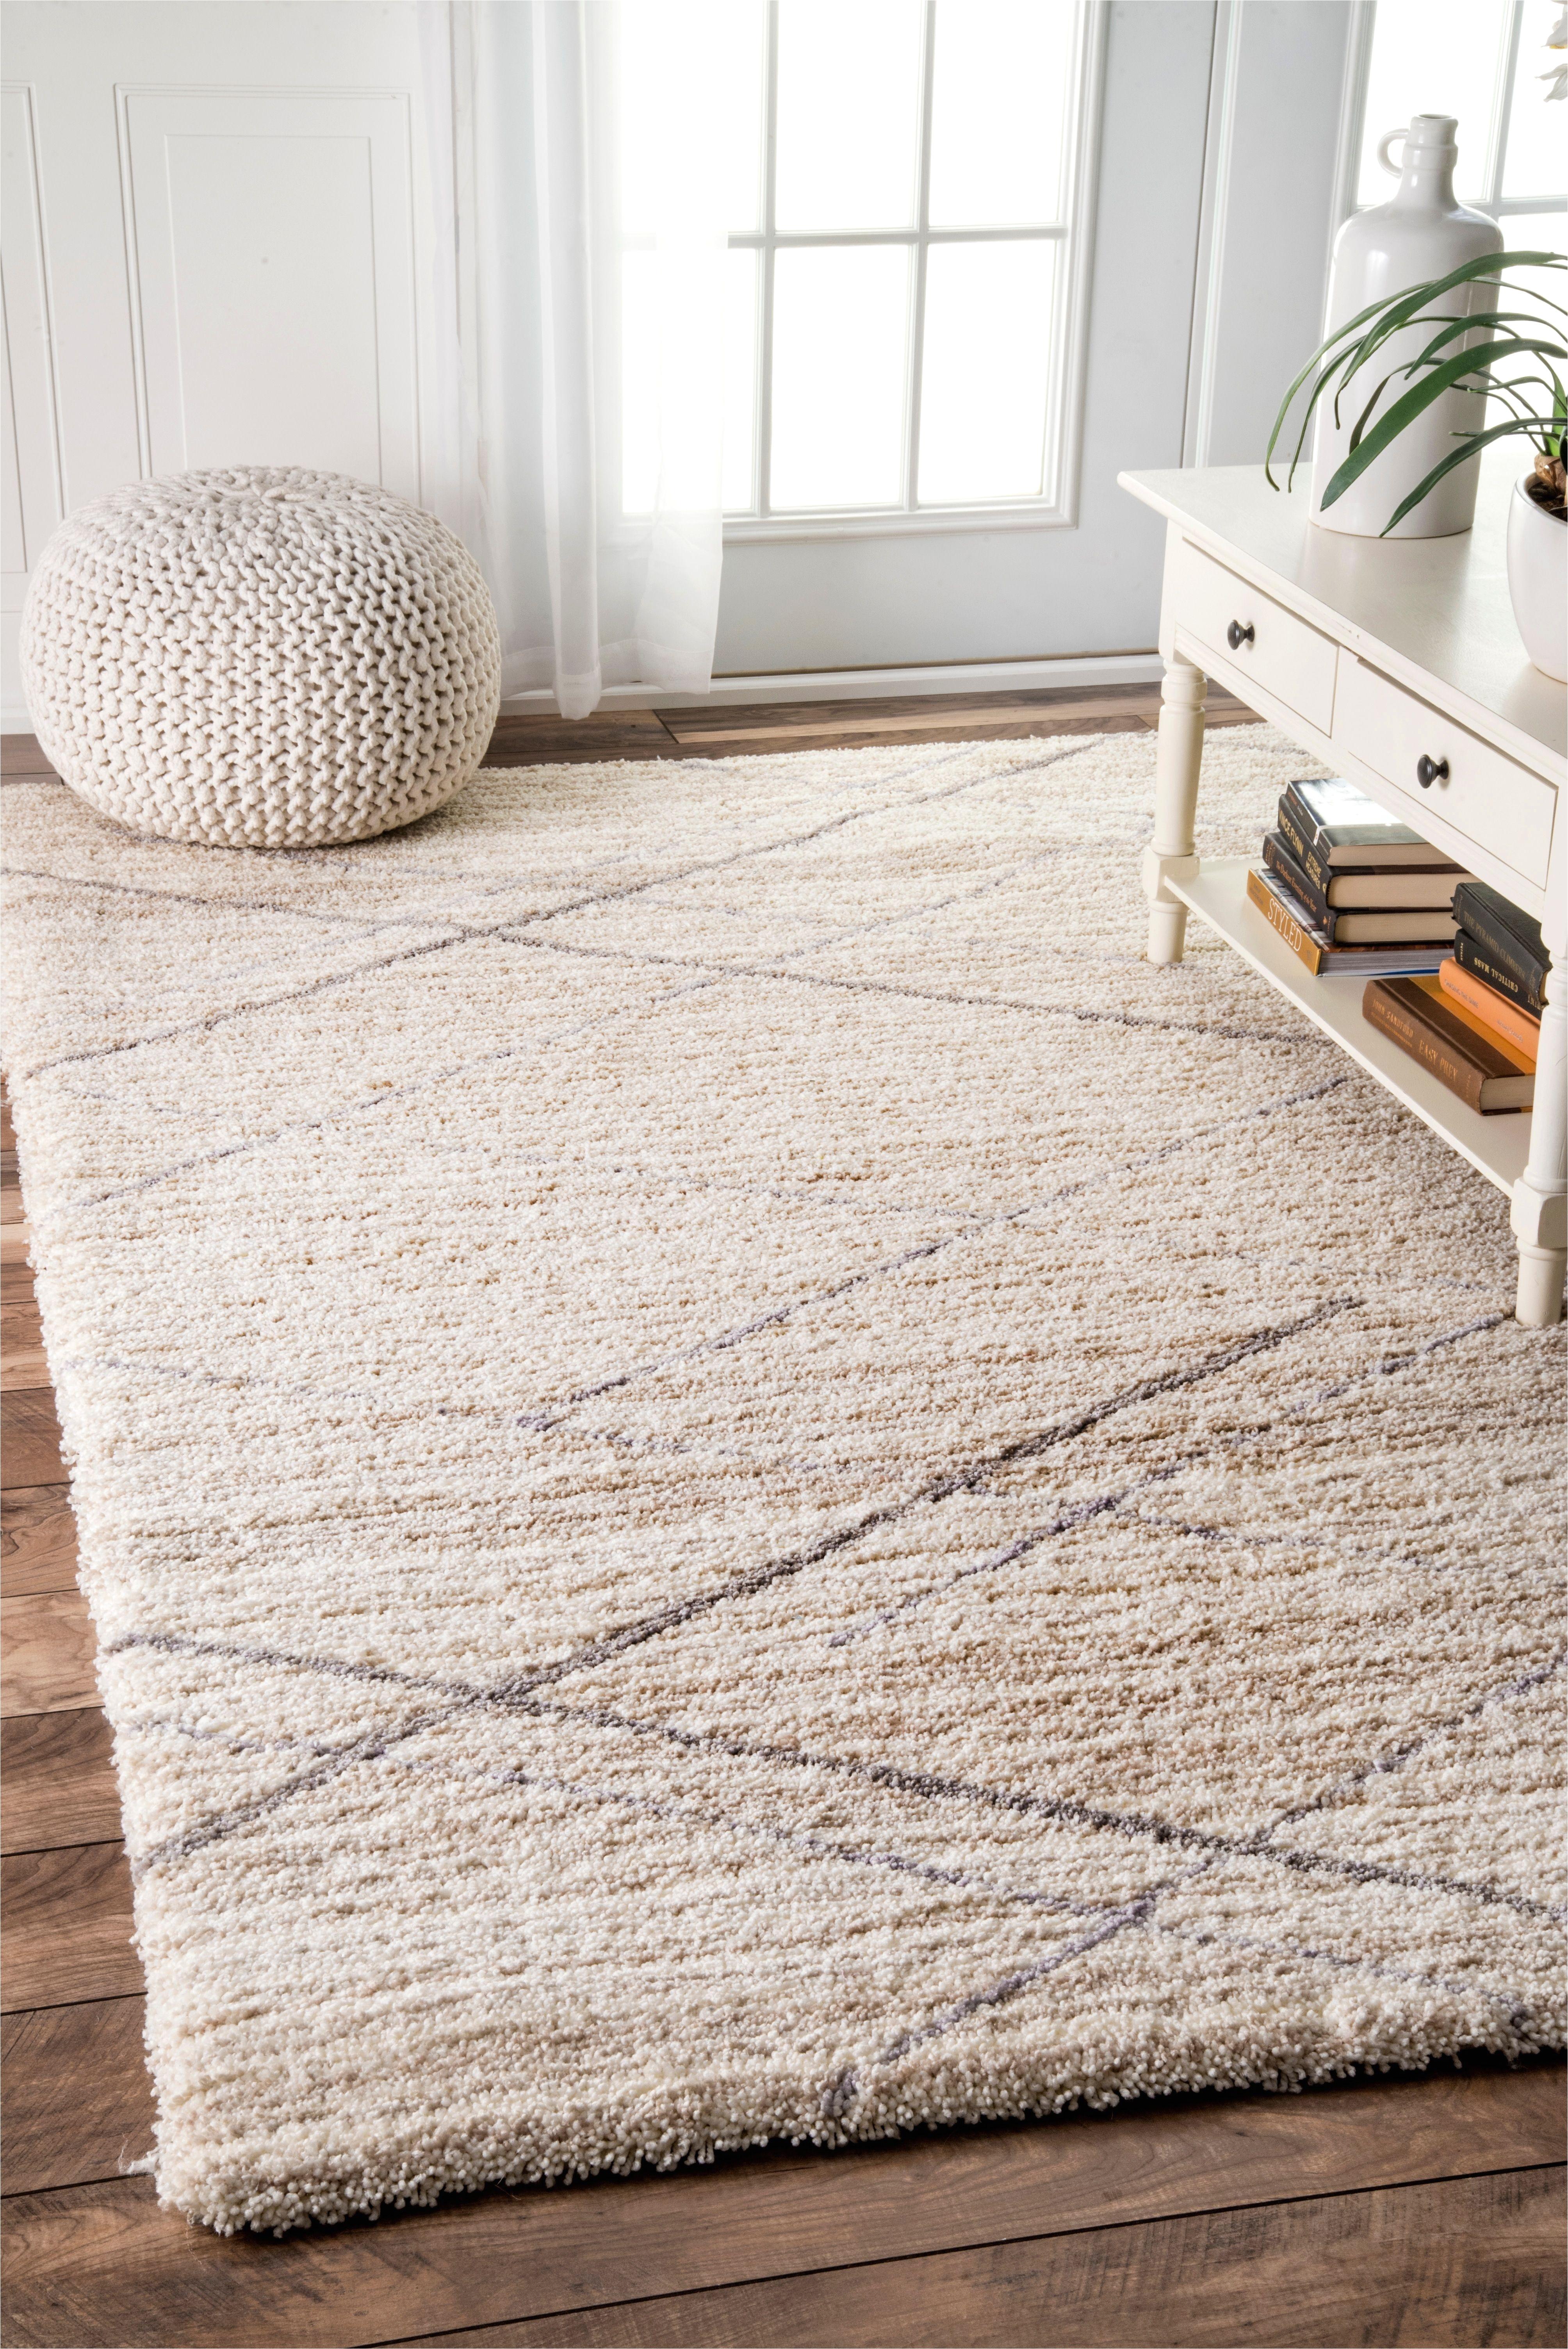 how to buy an area rug for living room unique rugs usa snowpeak diamond trellis shag